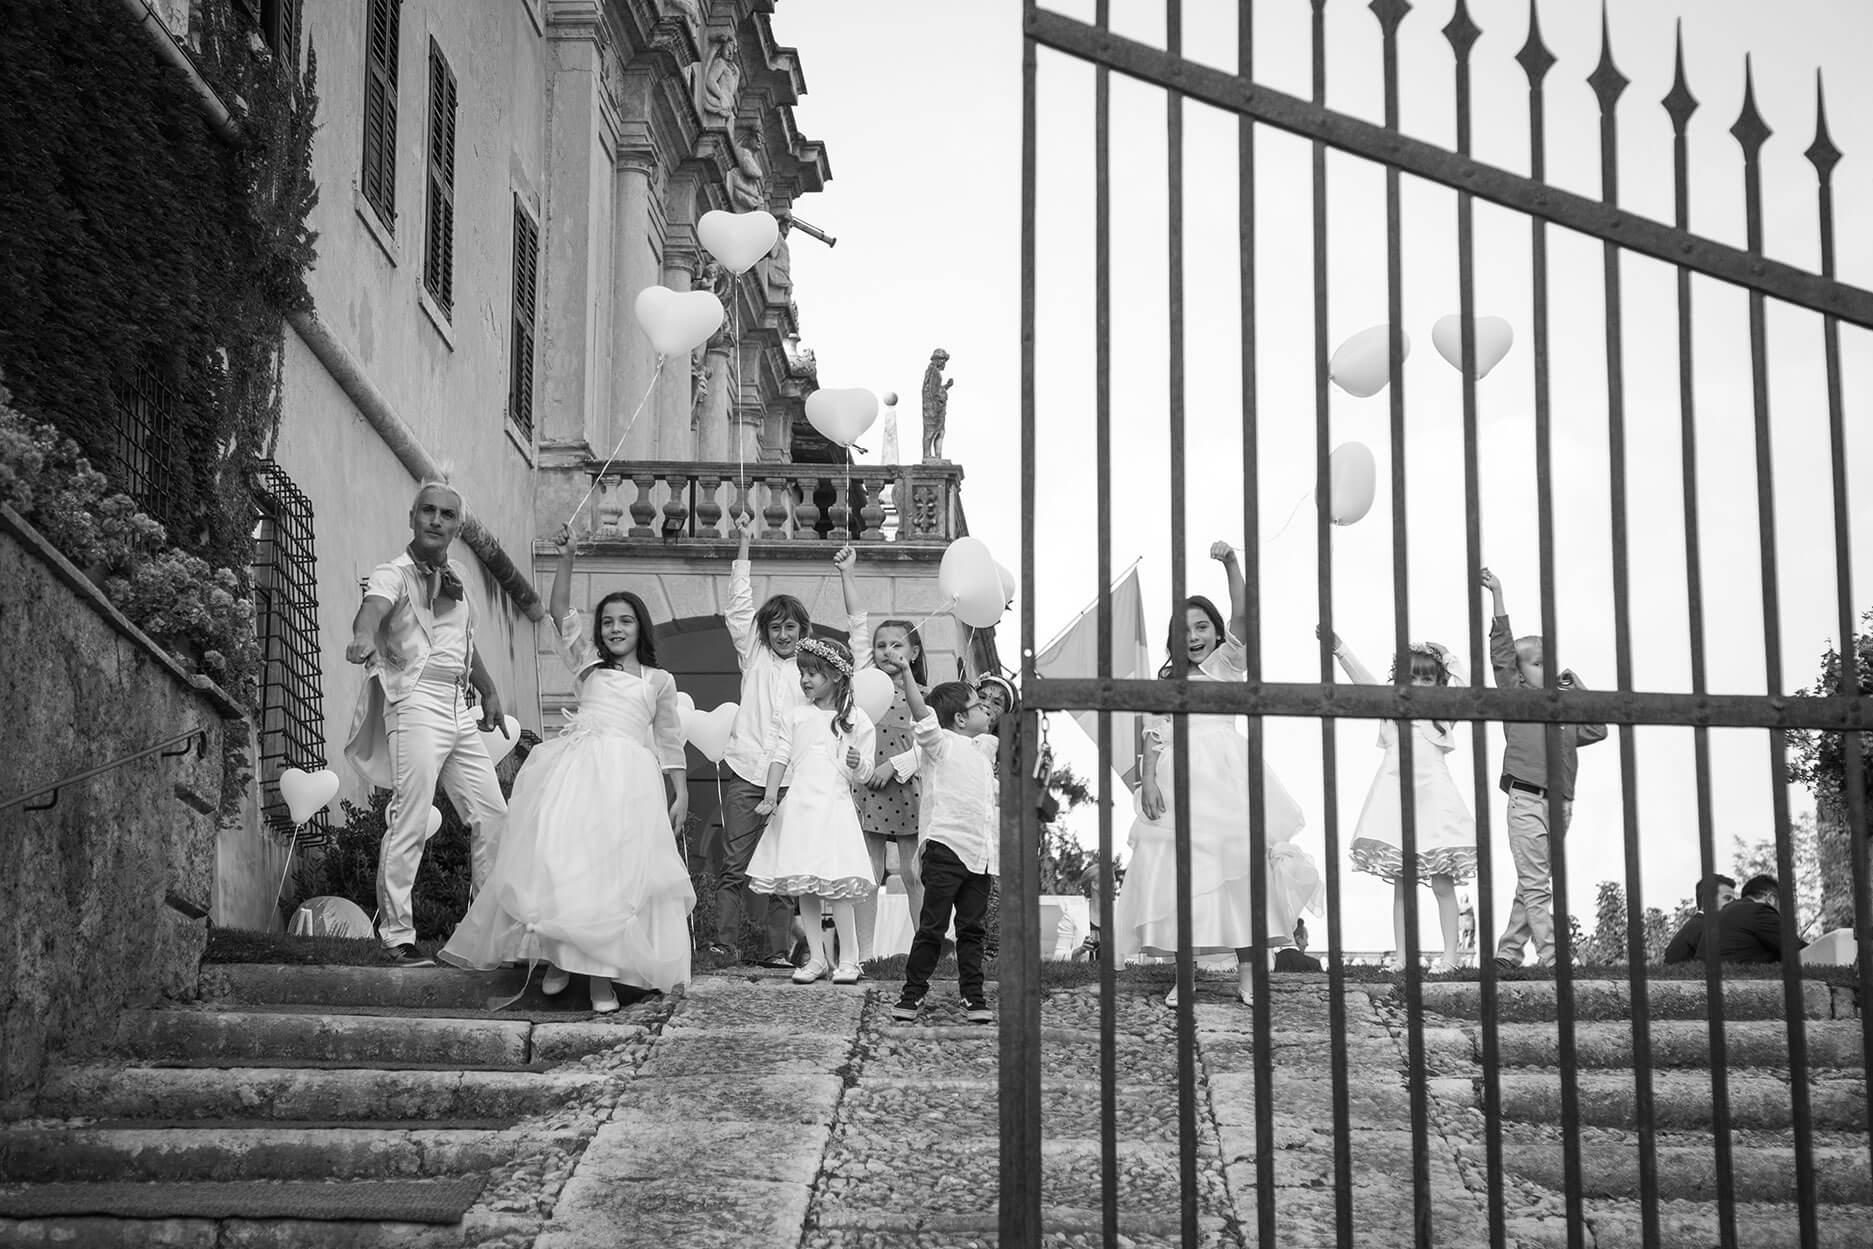 Francesca-Ferrati-WeddingIMG_0002